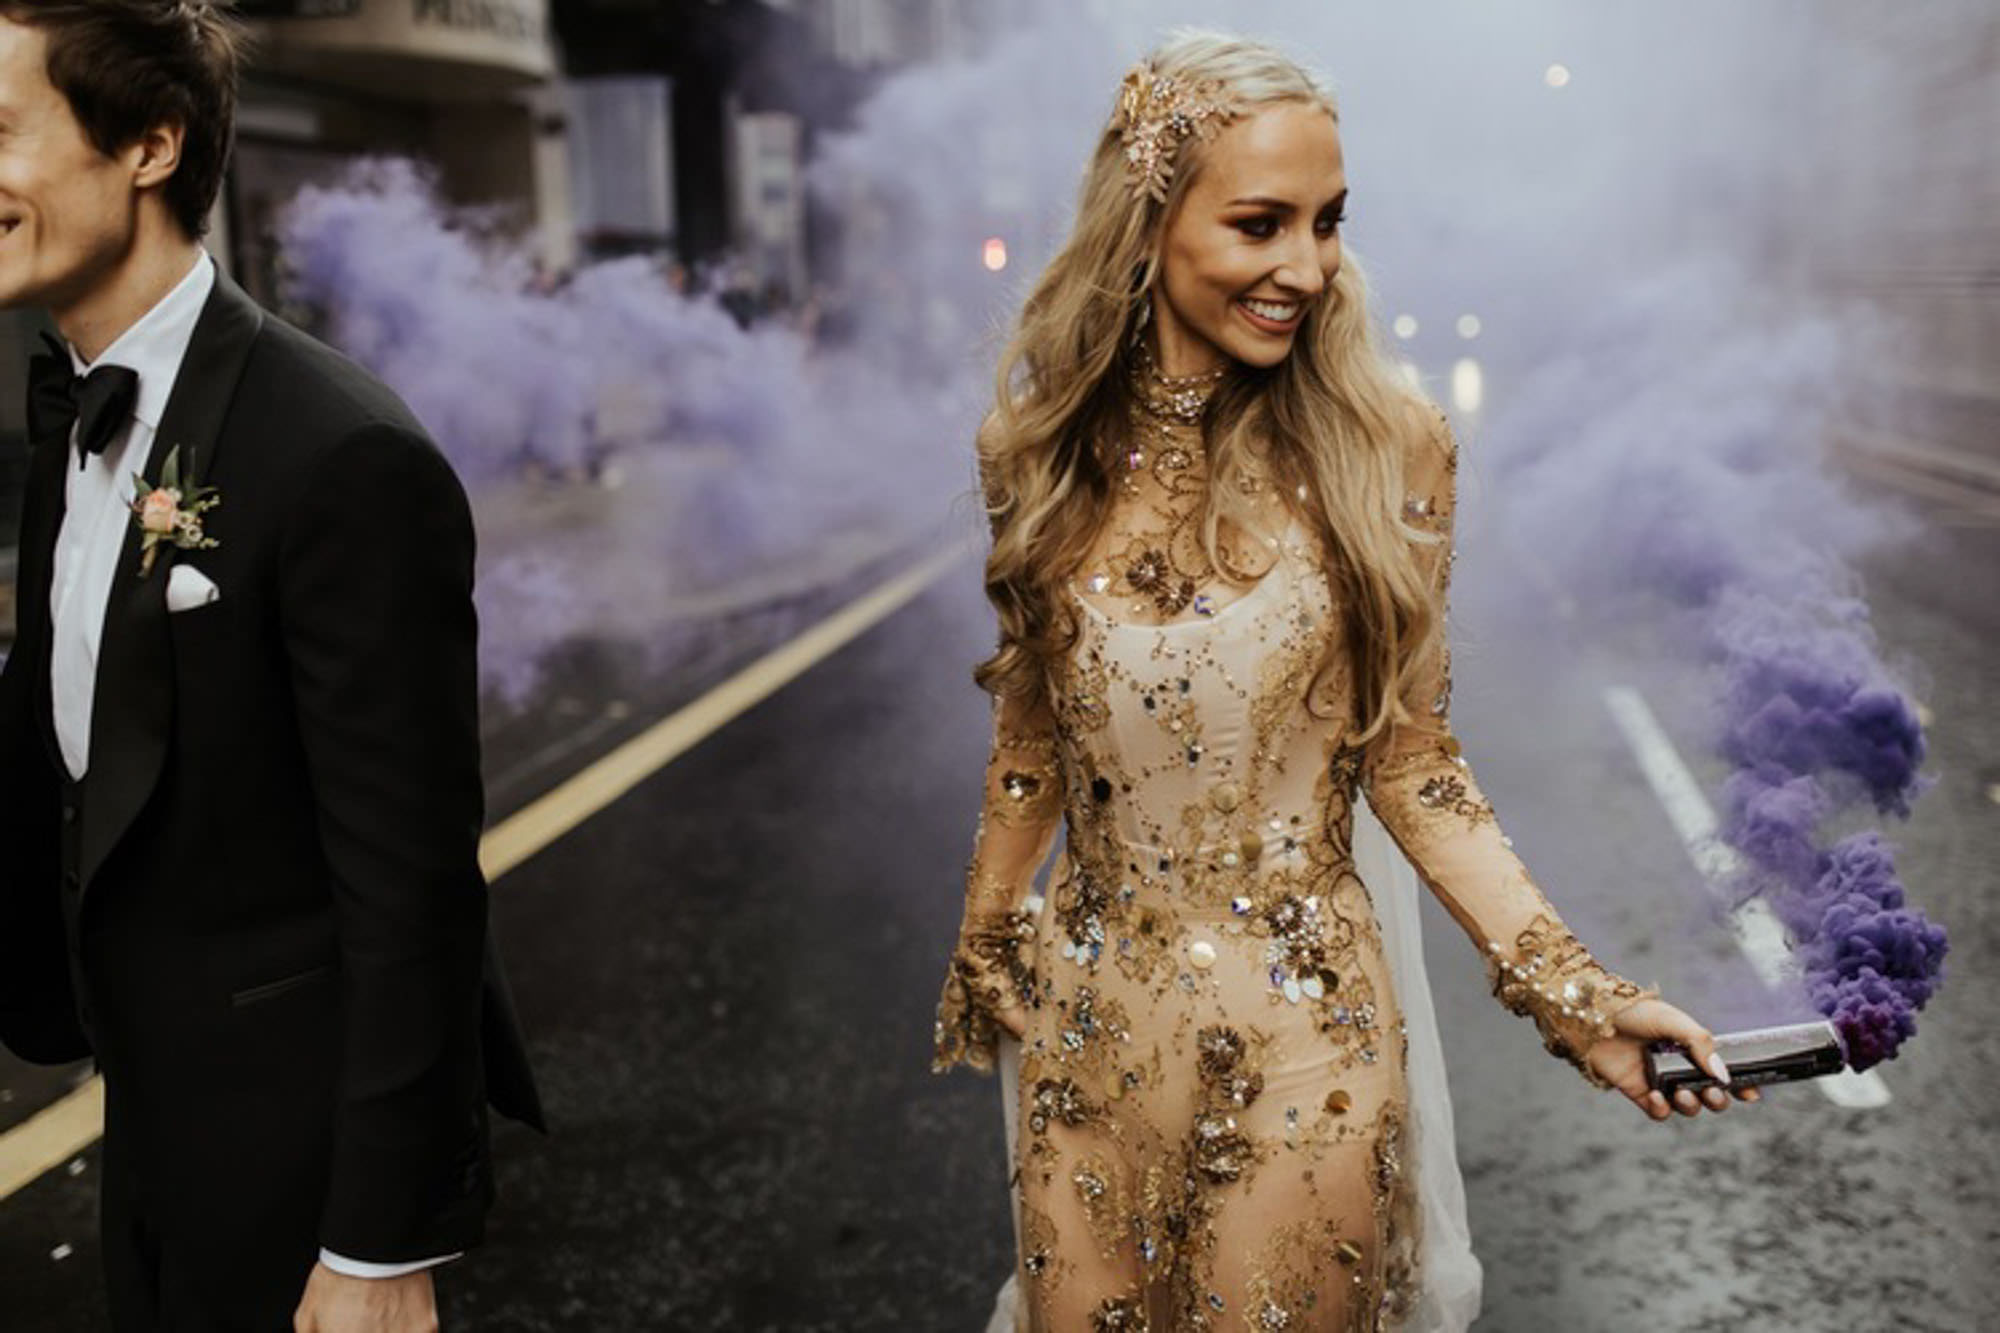 Wilden Bride - Bespoke London Bridal Designer